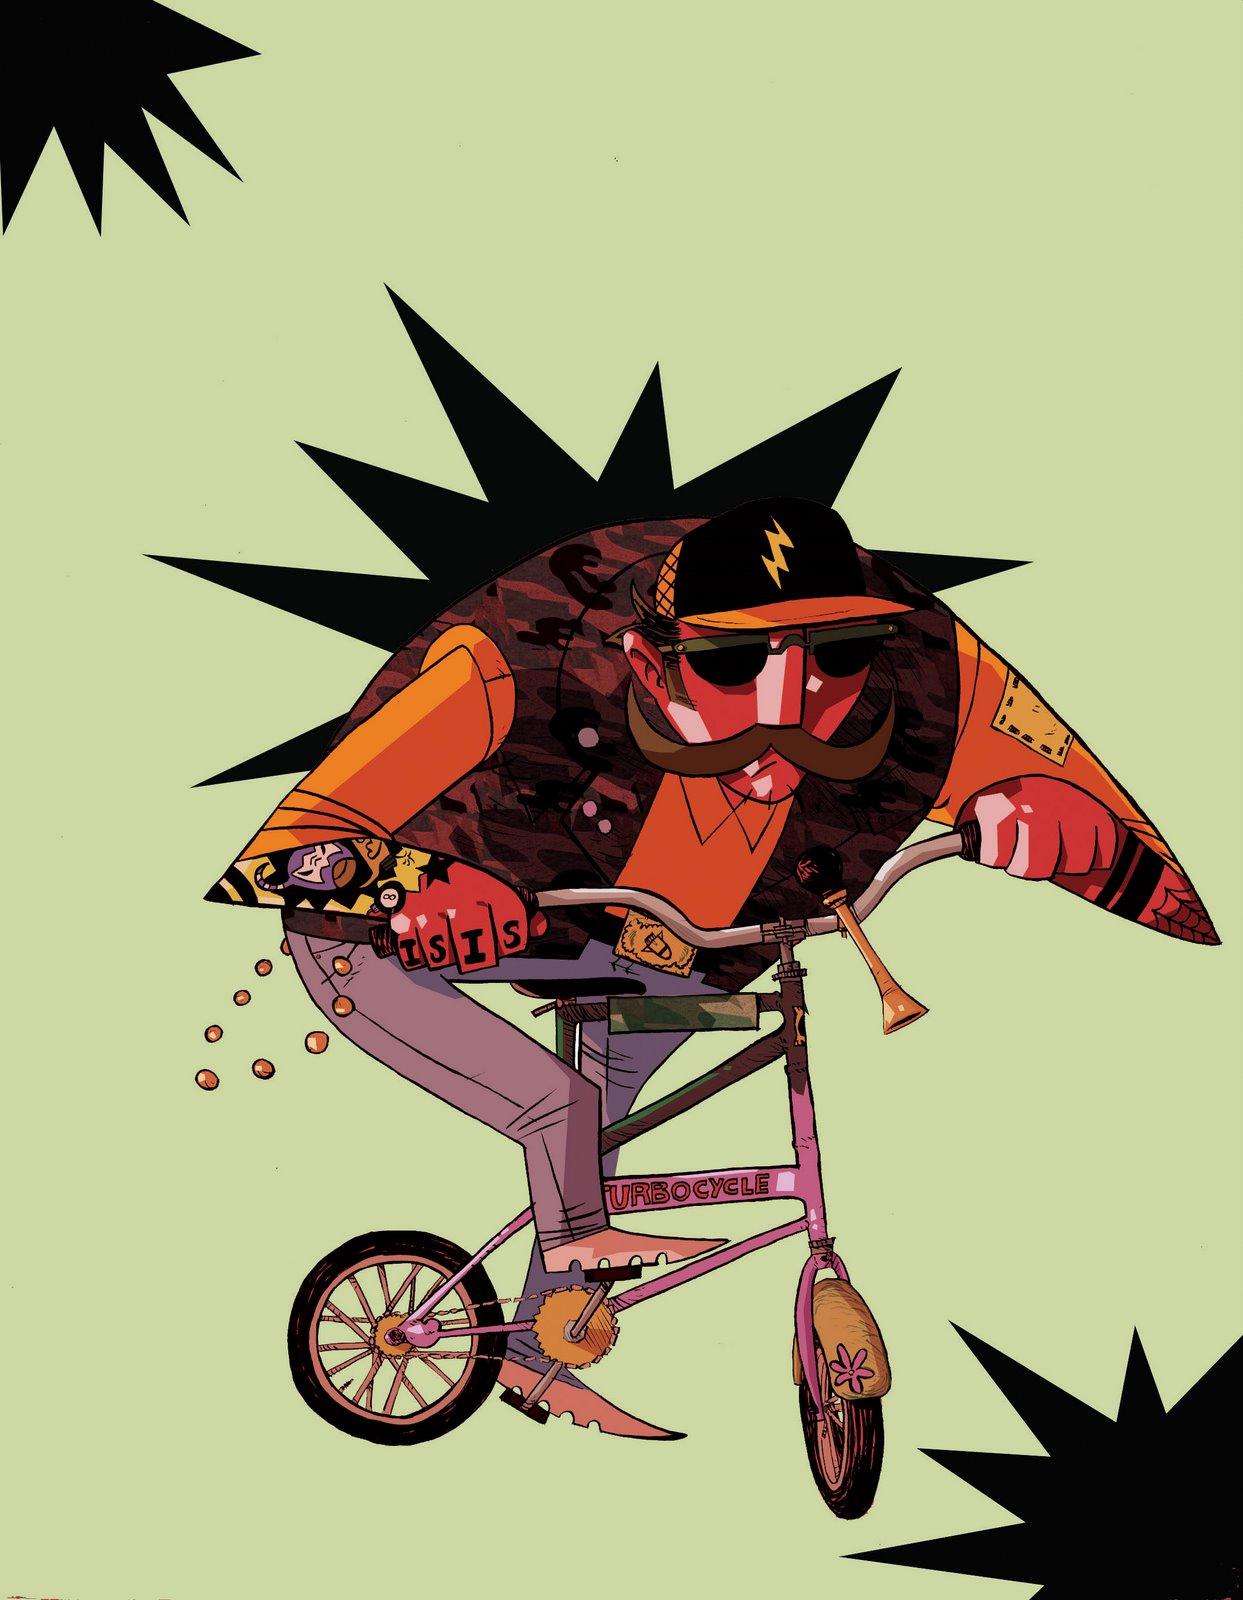 double itty-bitty bike